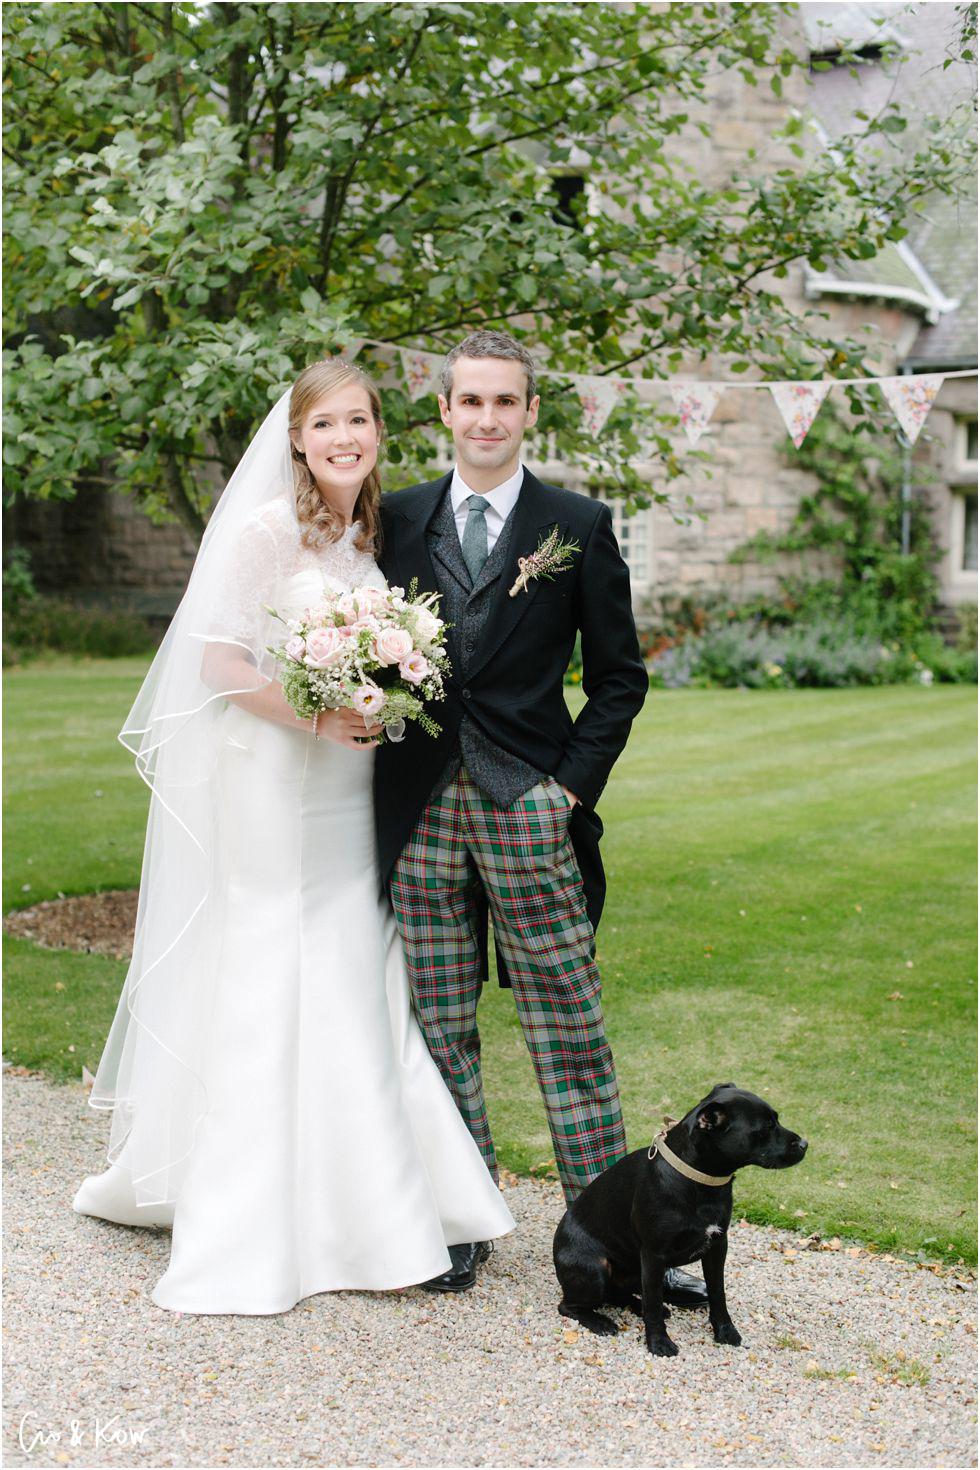 Sally-and-James-wedding-photography-Glen-Tanar-20.jpg